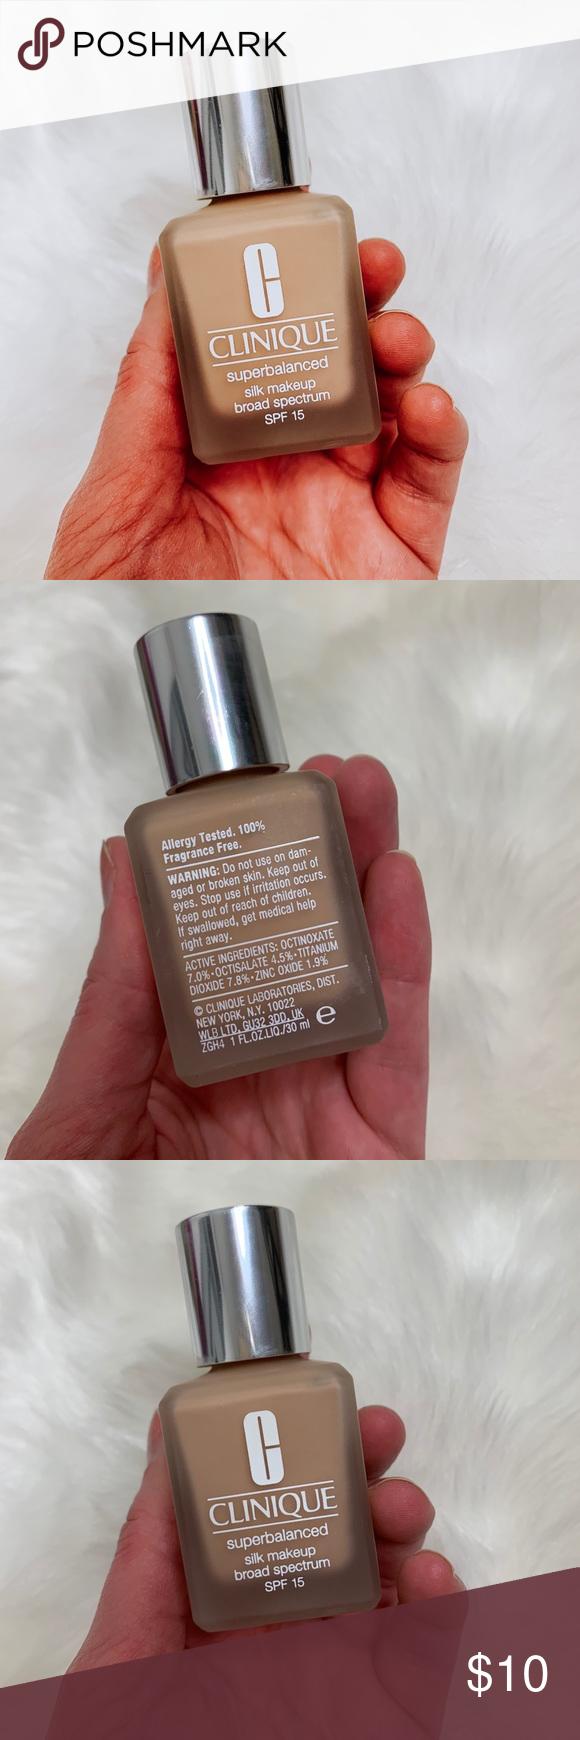 Clinique Superbalanced Silk Makeup Fragrance free